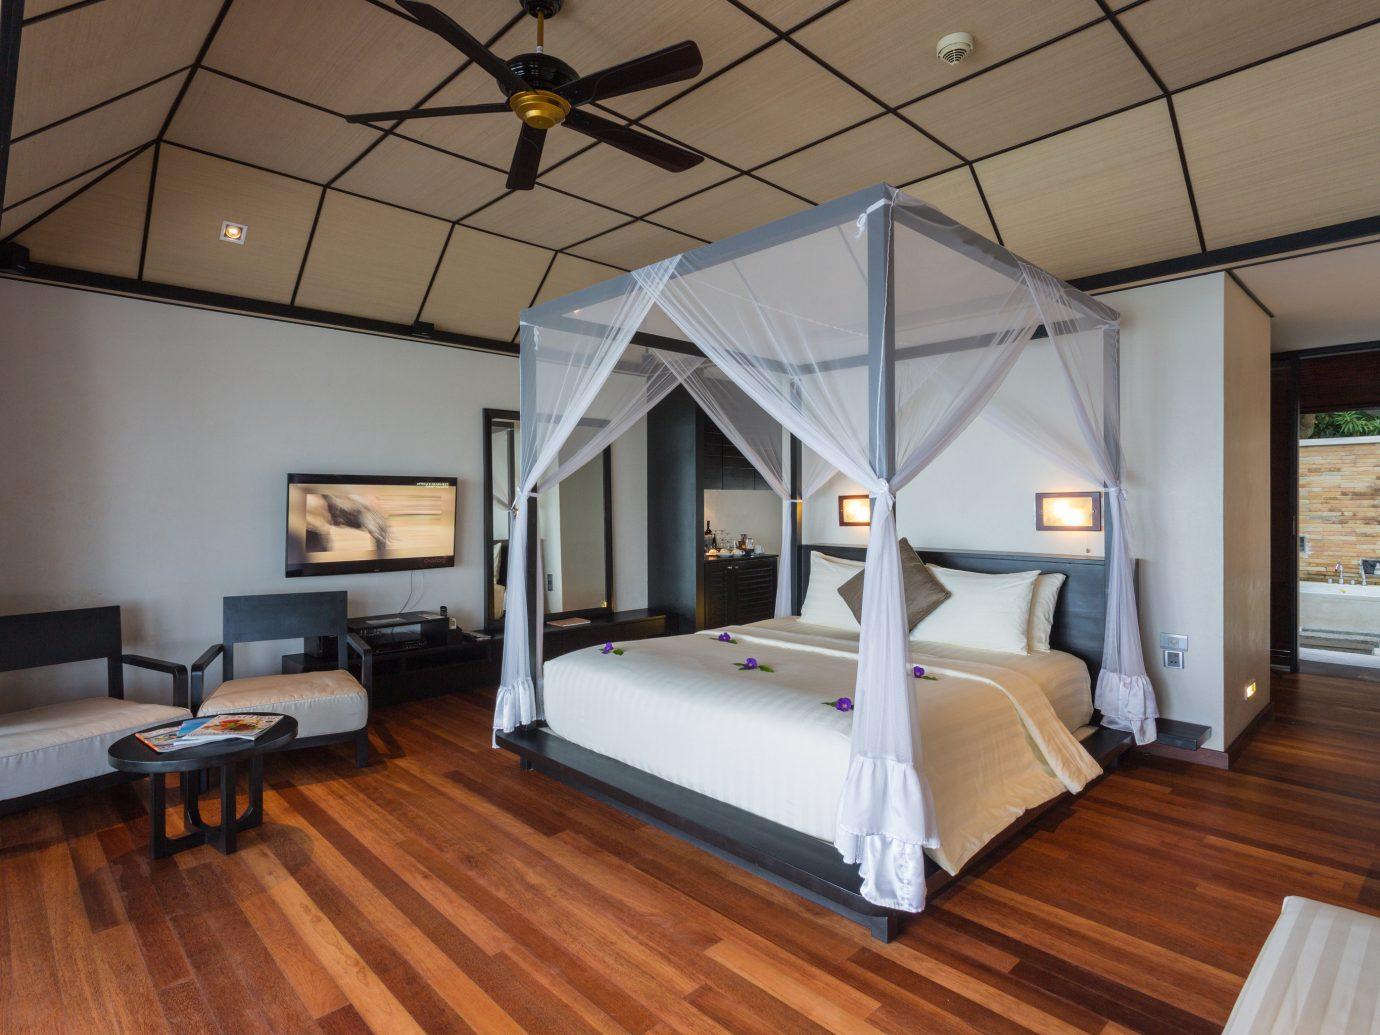 All-Inclusive Resorts Hotels floor indoor wall room building ceiling Living wood interior design hard flooring real estate furniture loft daylighting Suite wood flooring